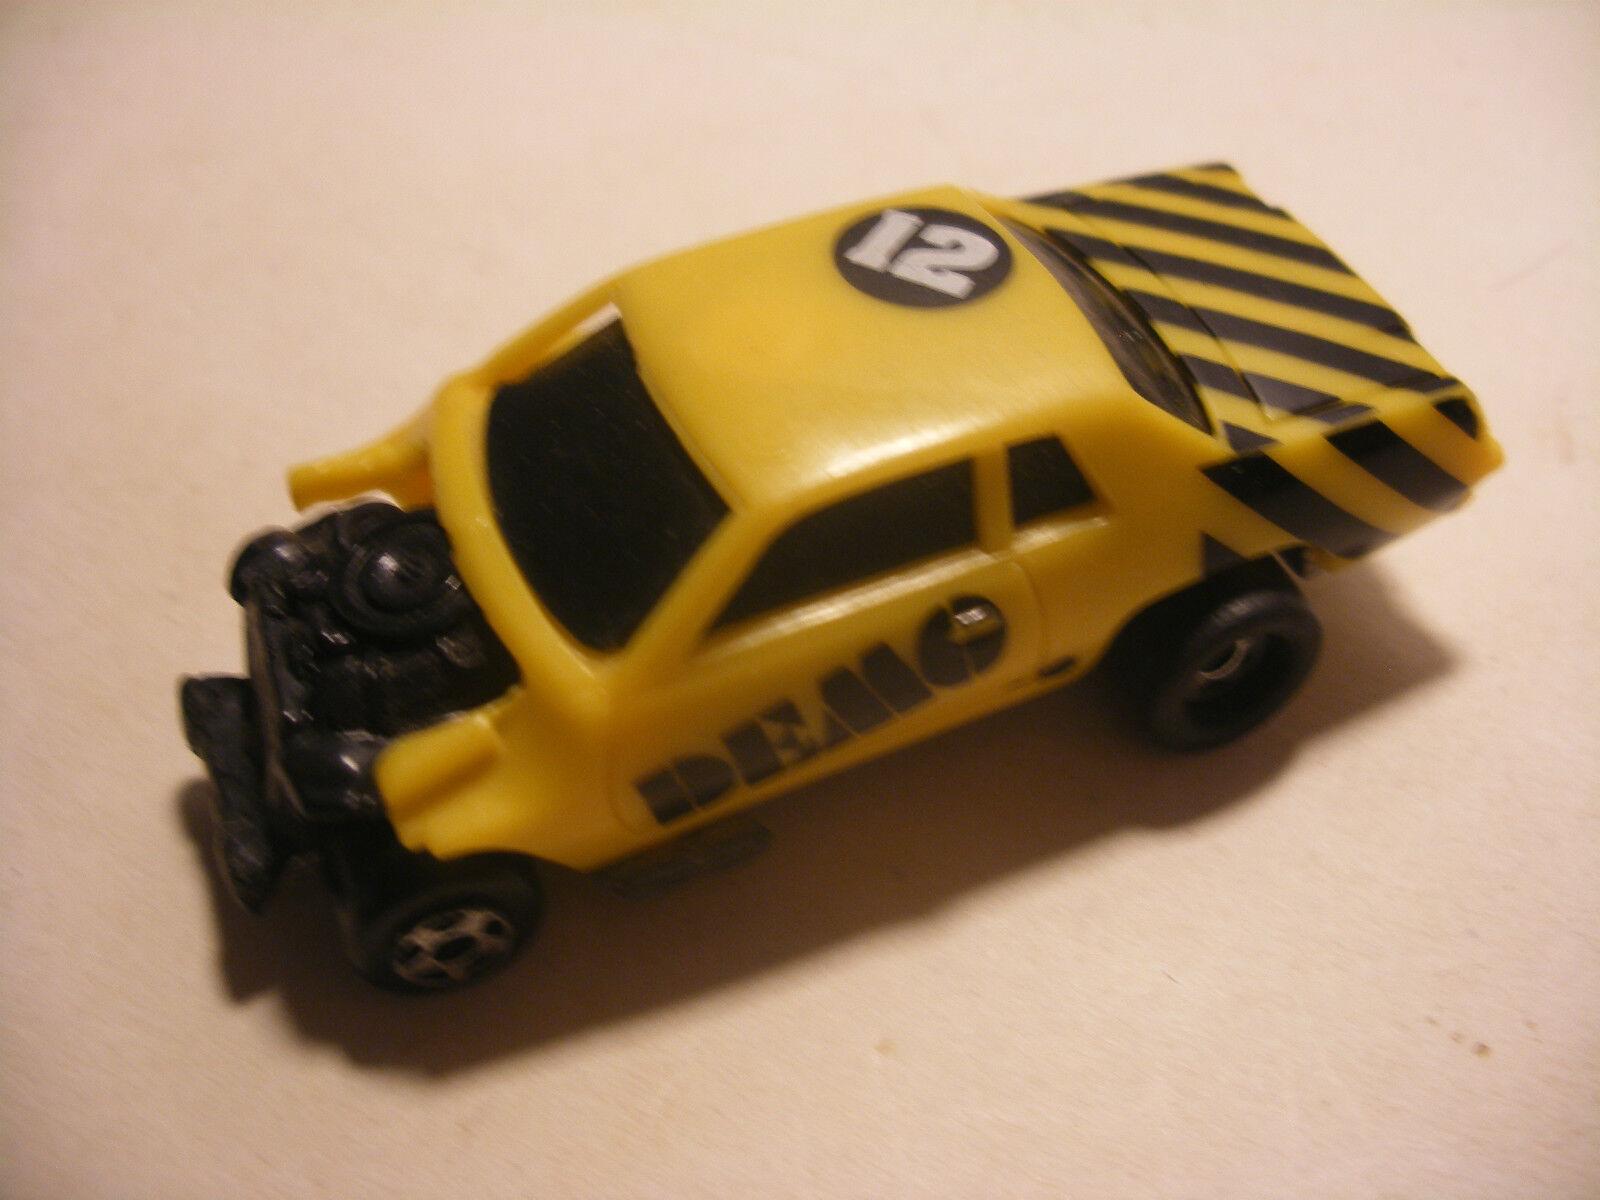 RARE Hot Wheels 1983 KIDCO BURNIN KEY Demolition Cars